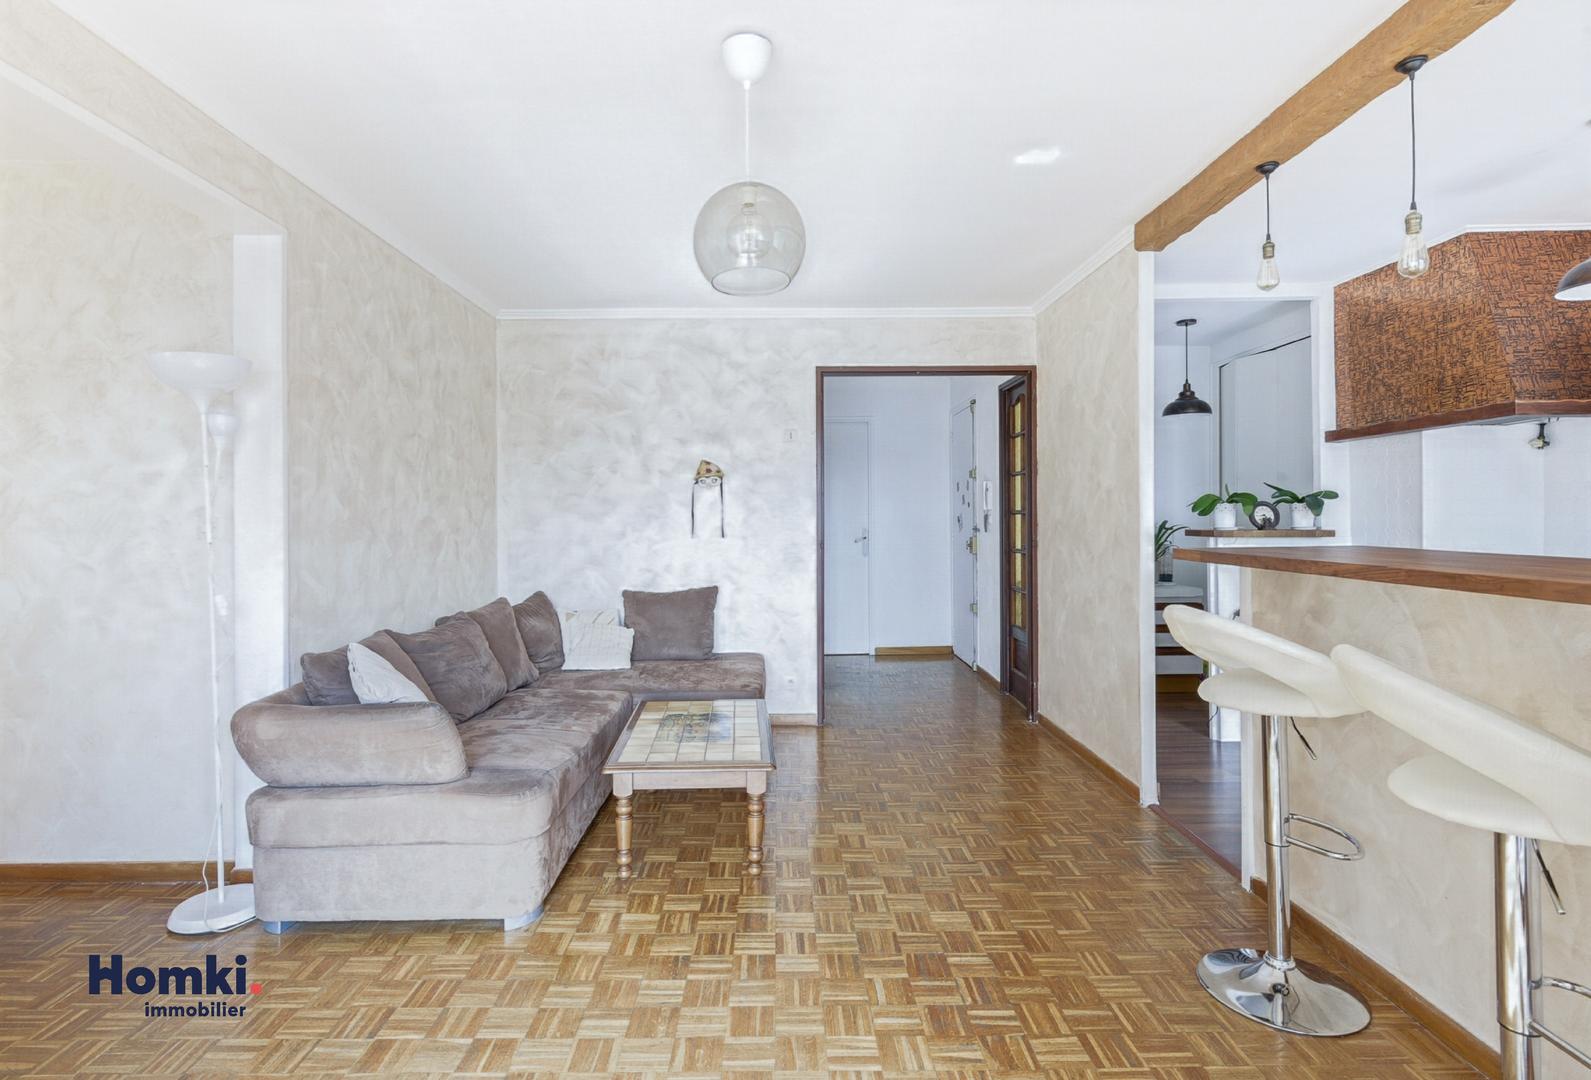 Vente appartement MArseille 13010 T5_3